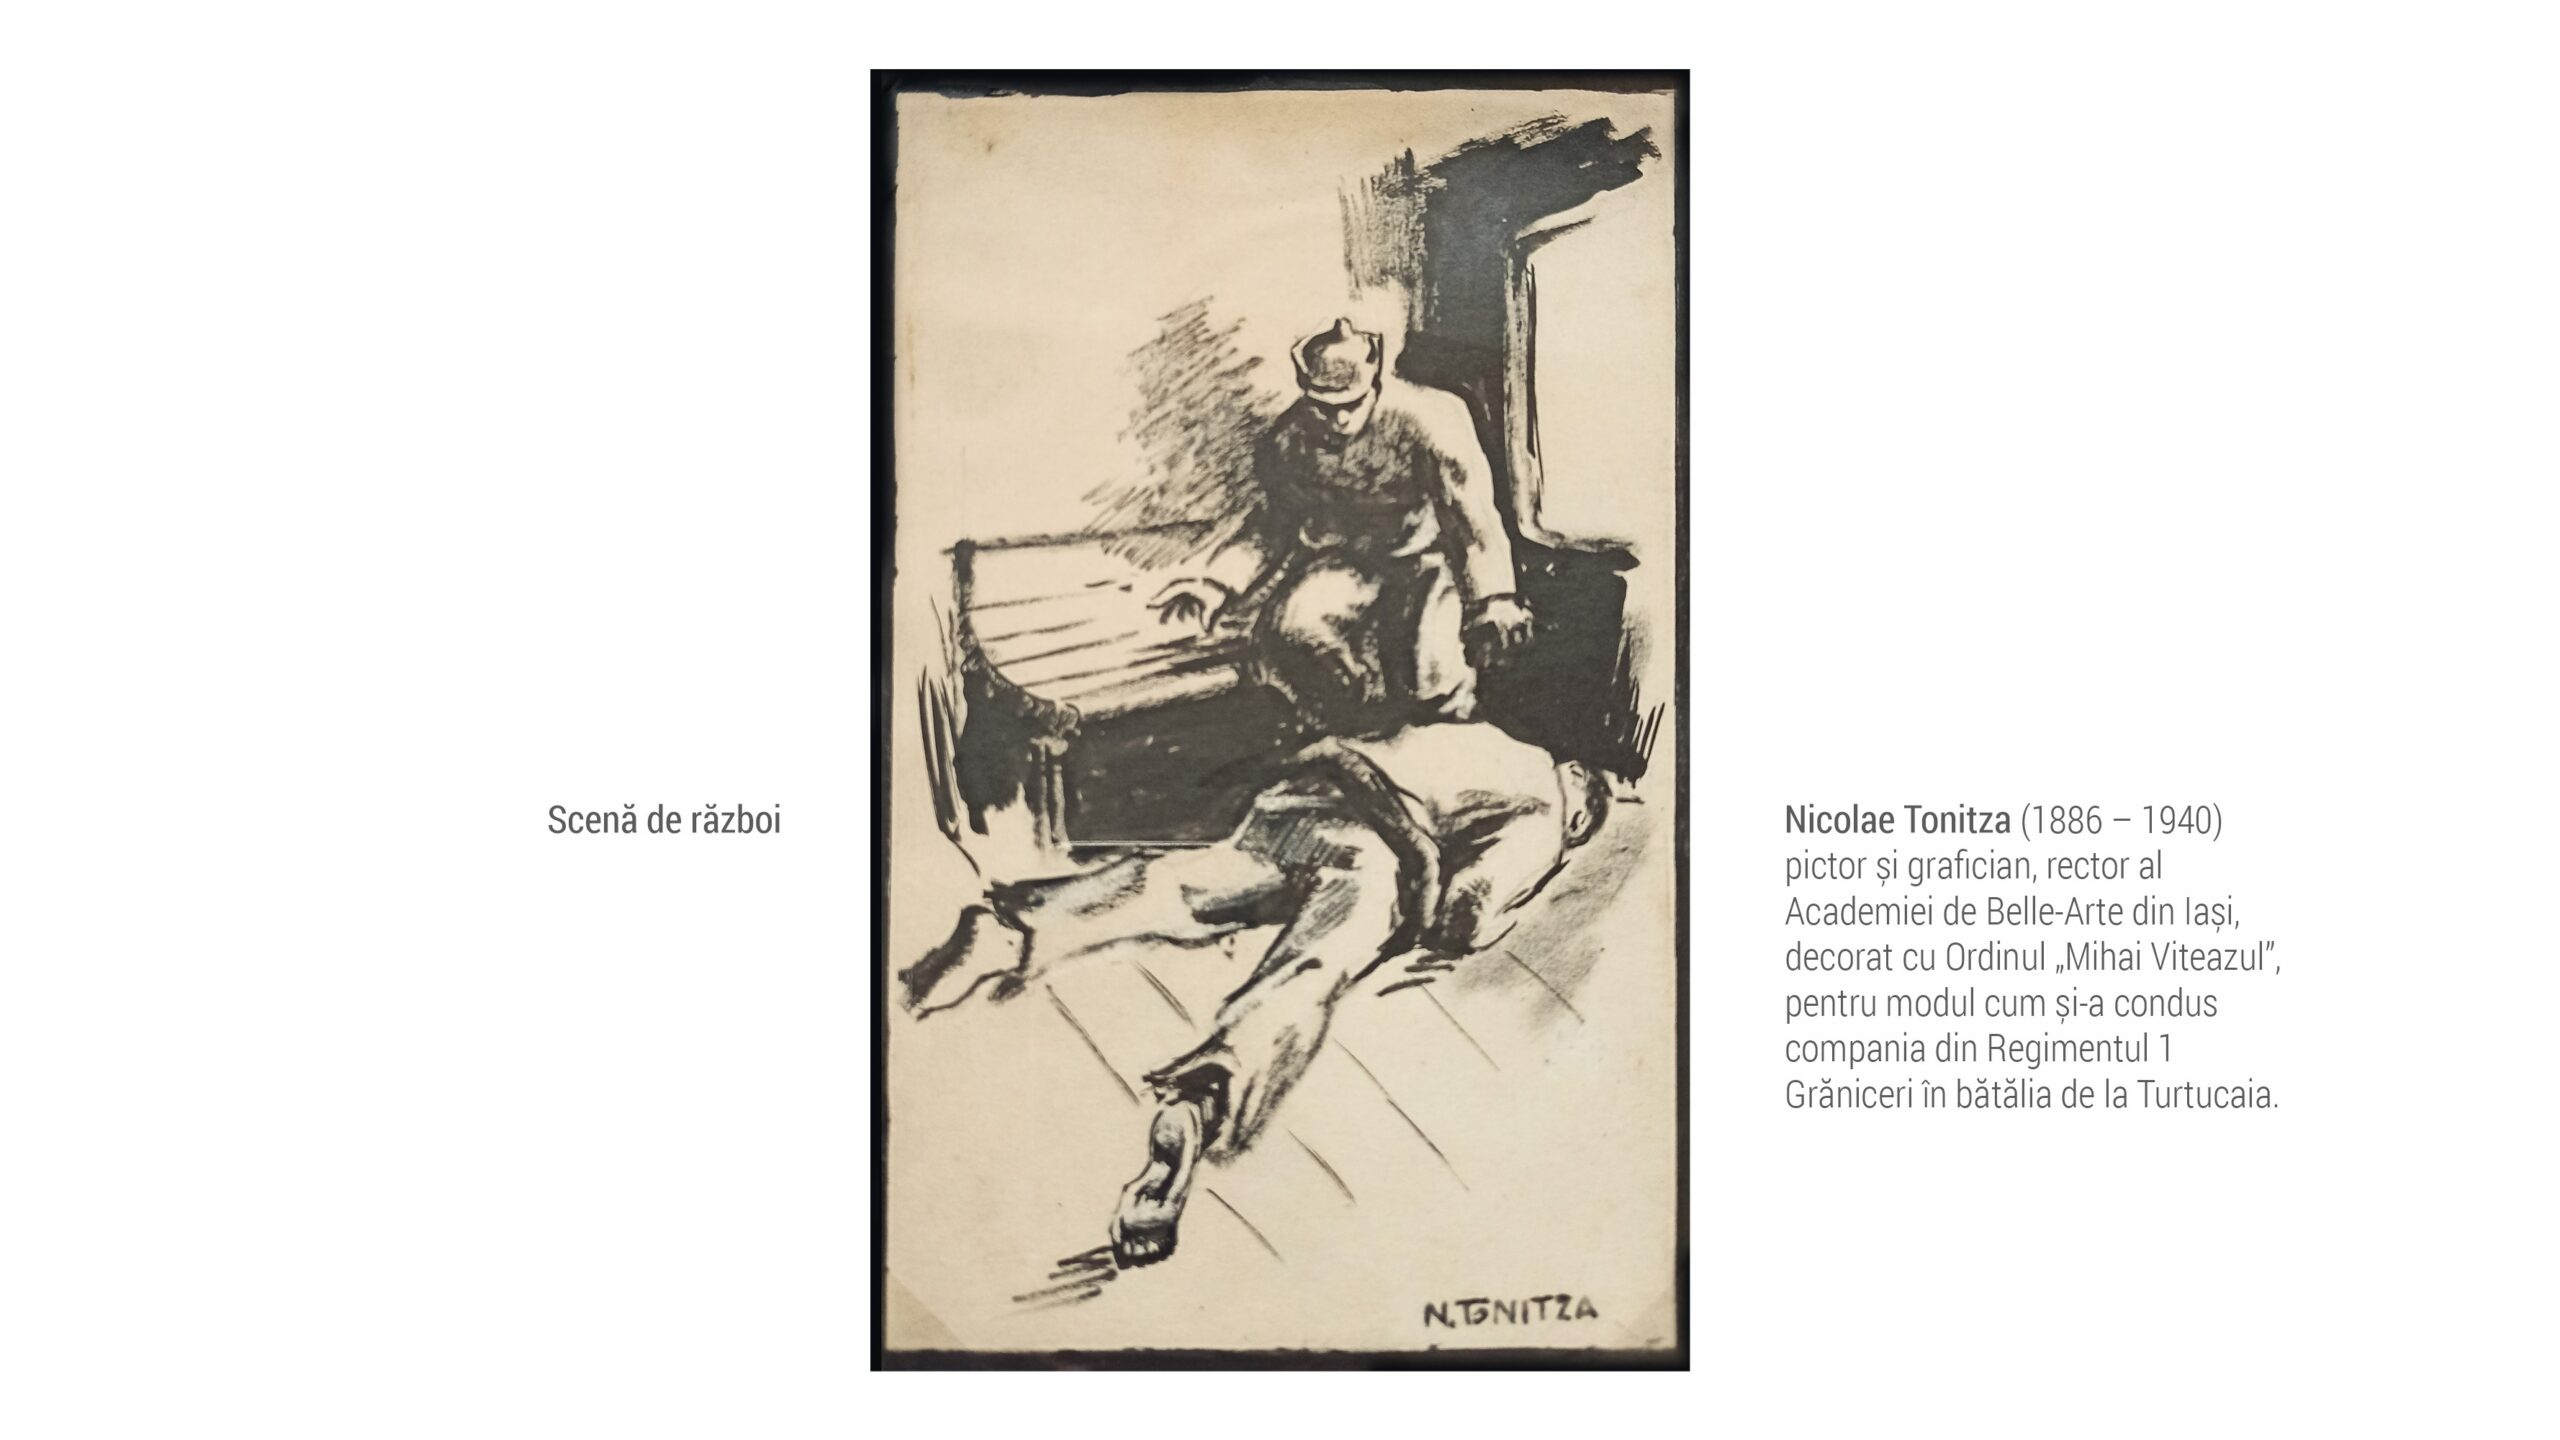 1886 NIcolae Tonitza - scena de razboi